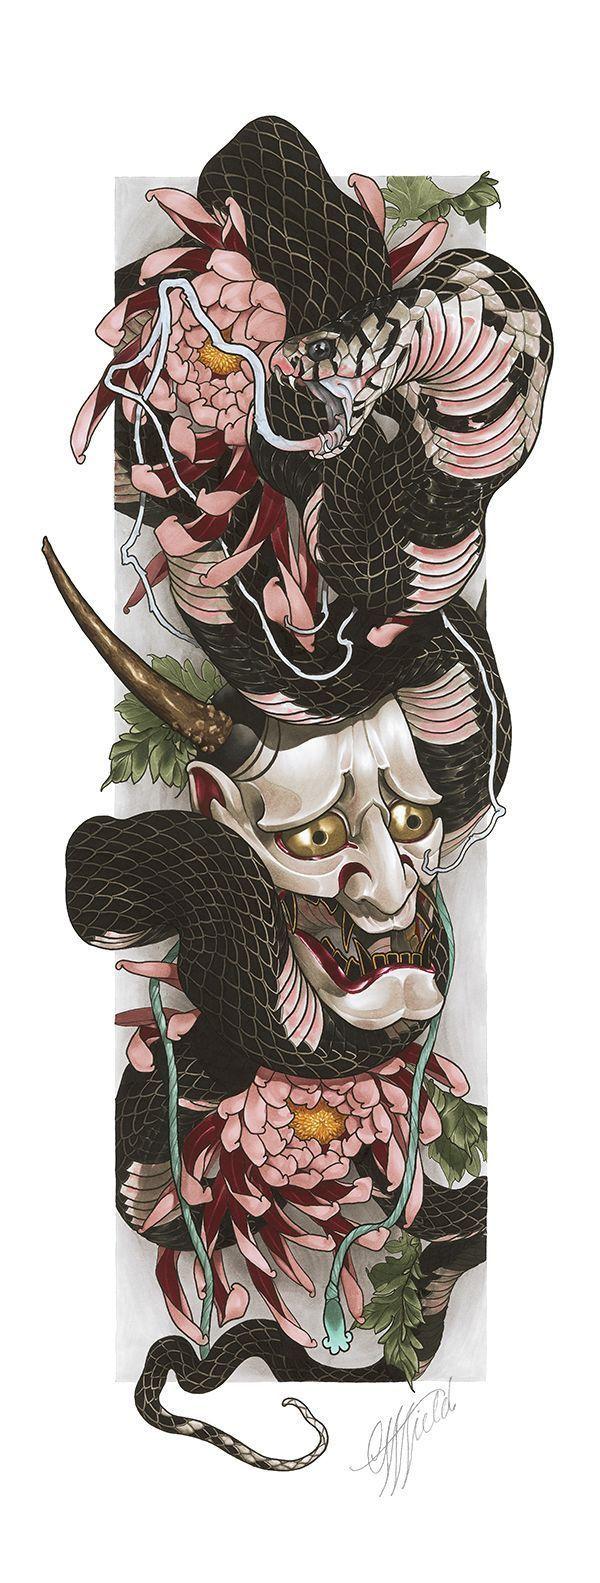 CWF  Hannya Snake Limited Edition (prints) #prints #edition #hannya #limited #snake